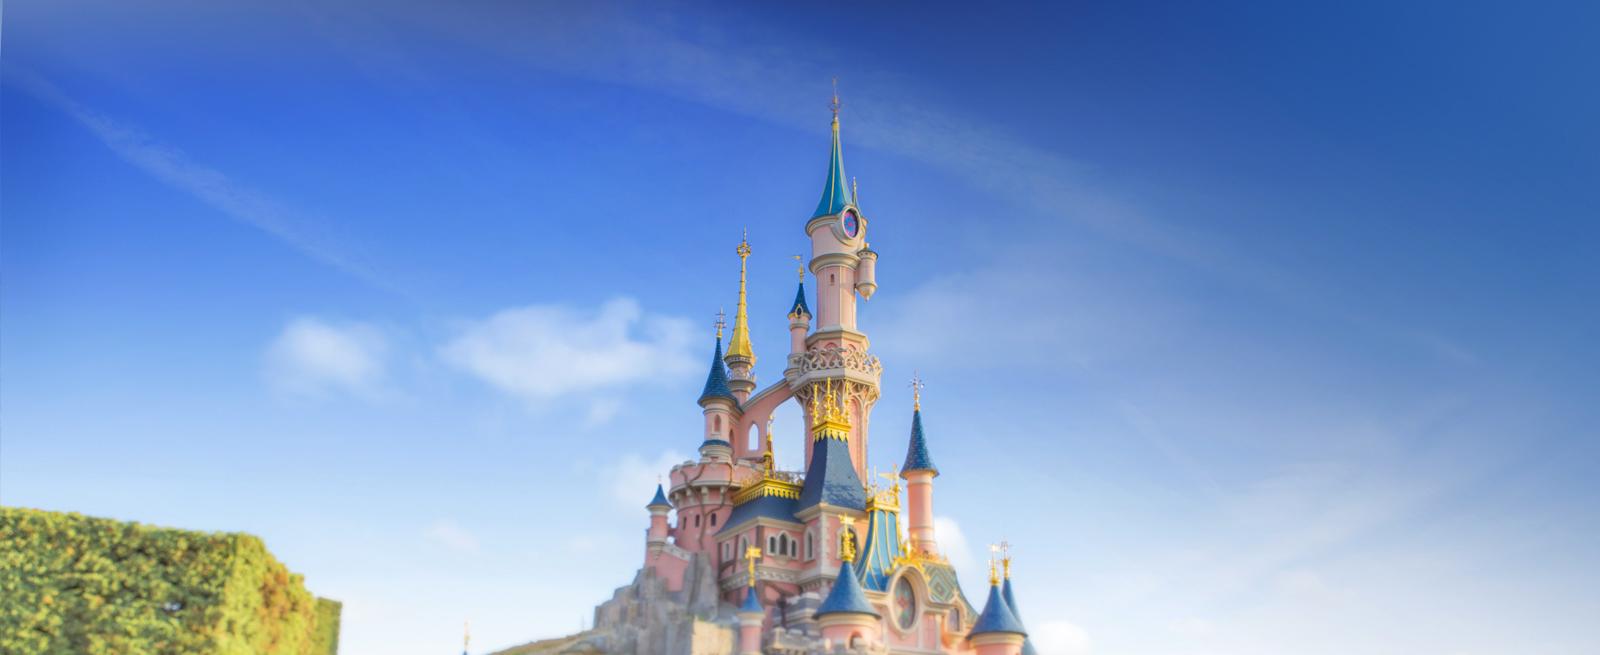 Disneyland© Paris